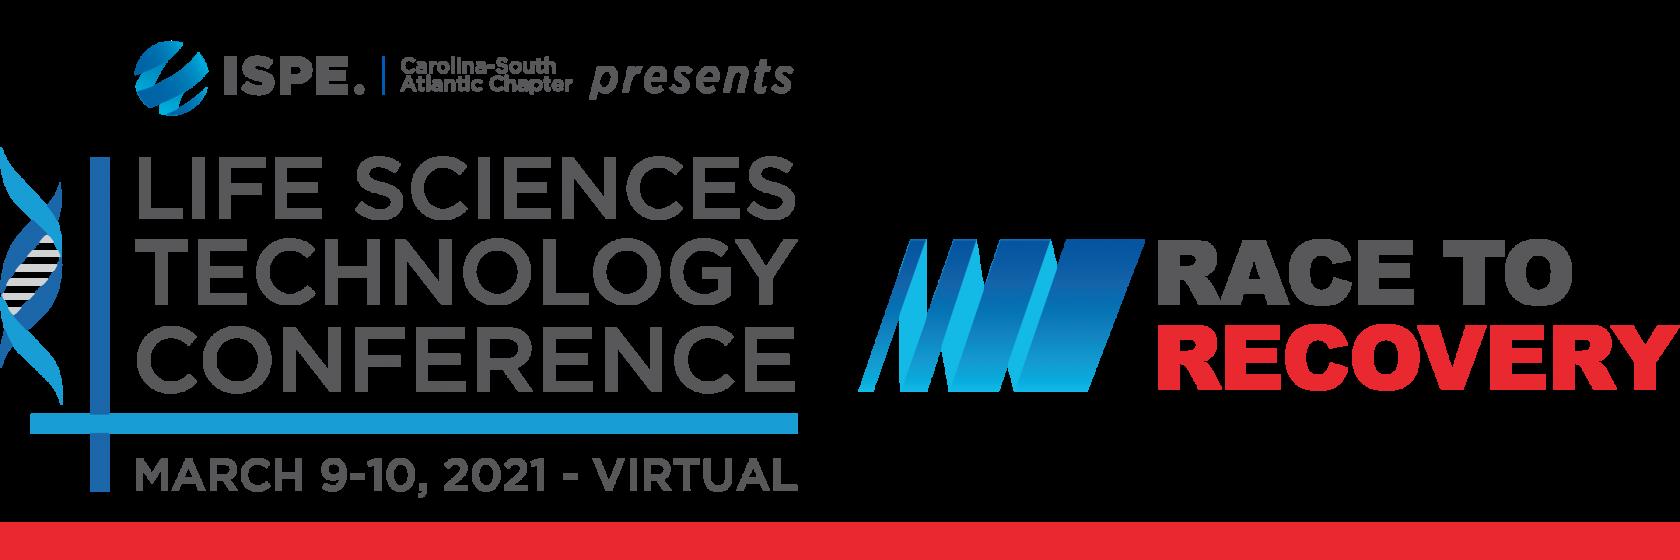 ISPE CaSA Technology Conference Logo